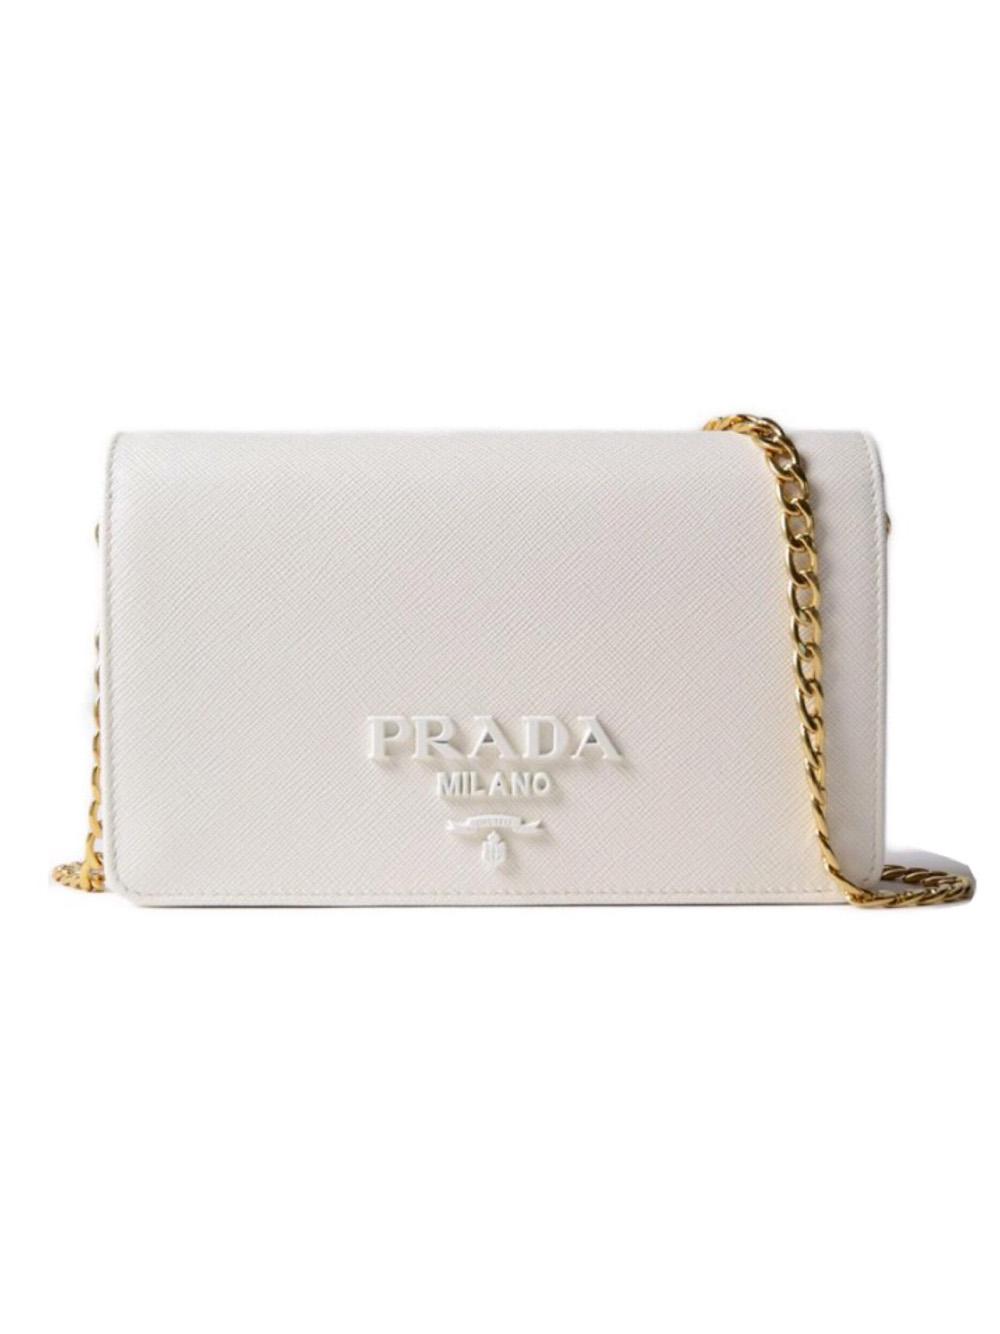 Prada Lux Wallet Bag